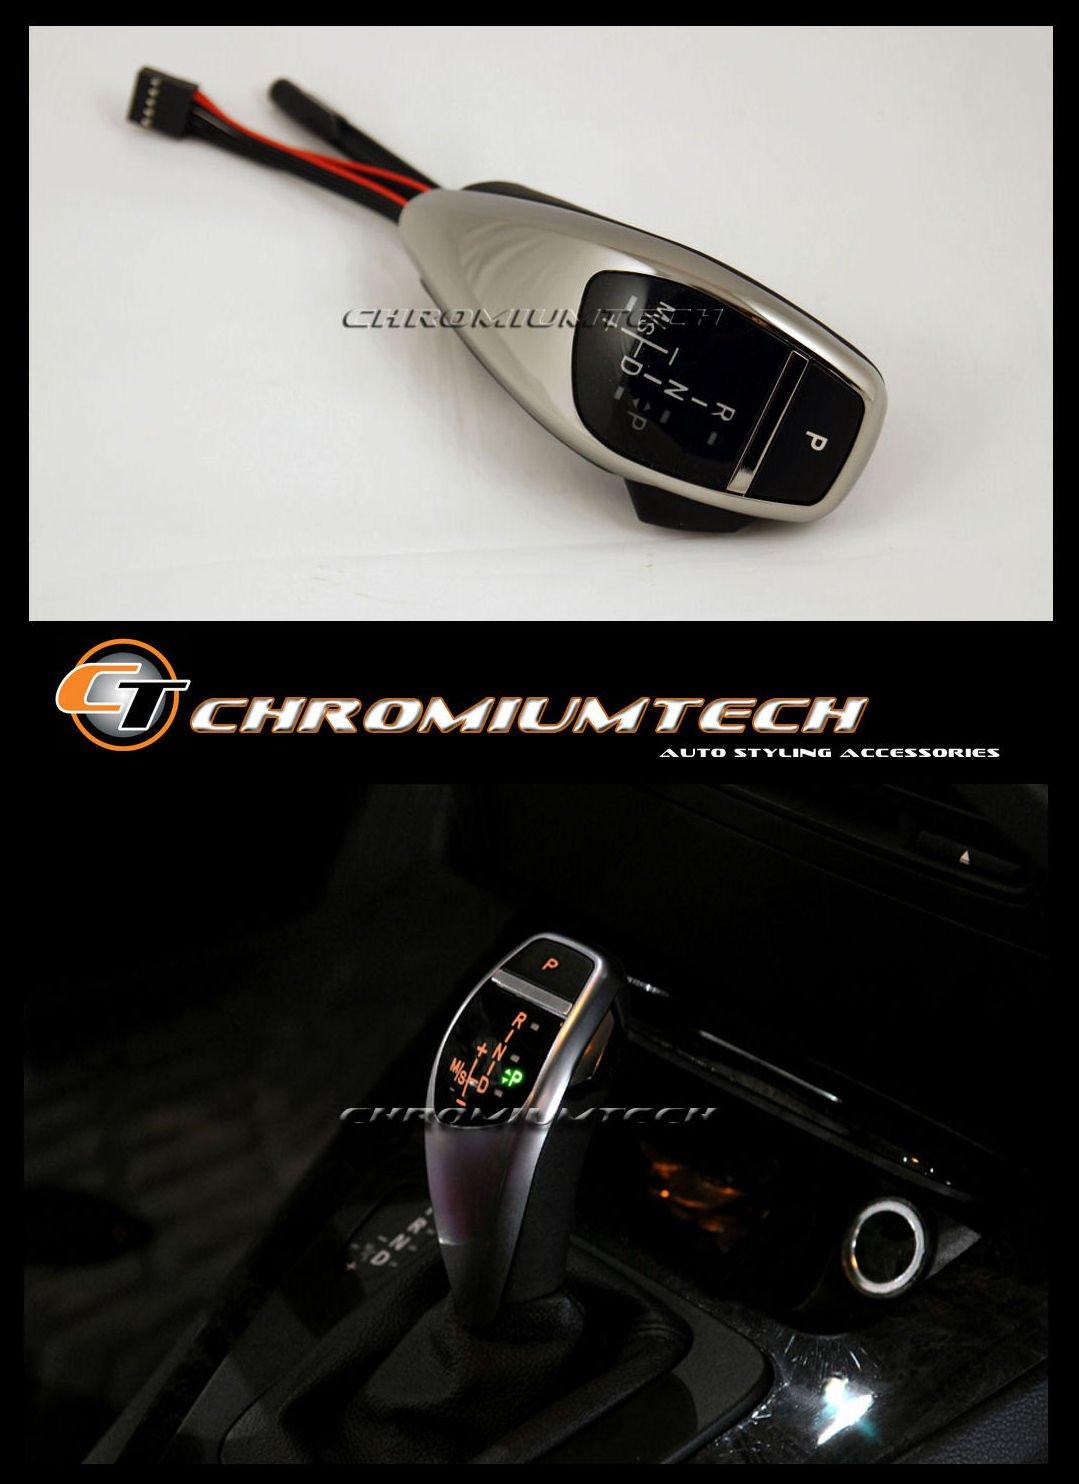 Racing Dash SG-E63LED-R-BK LED Gear Shift Knob